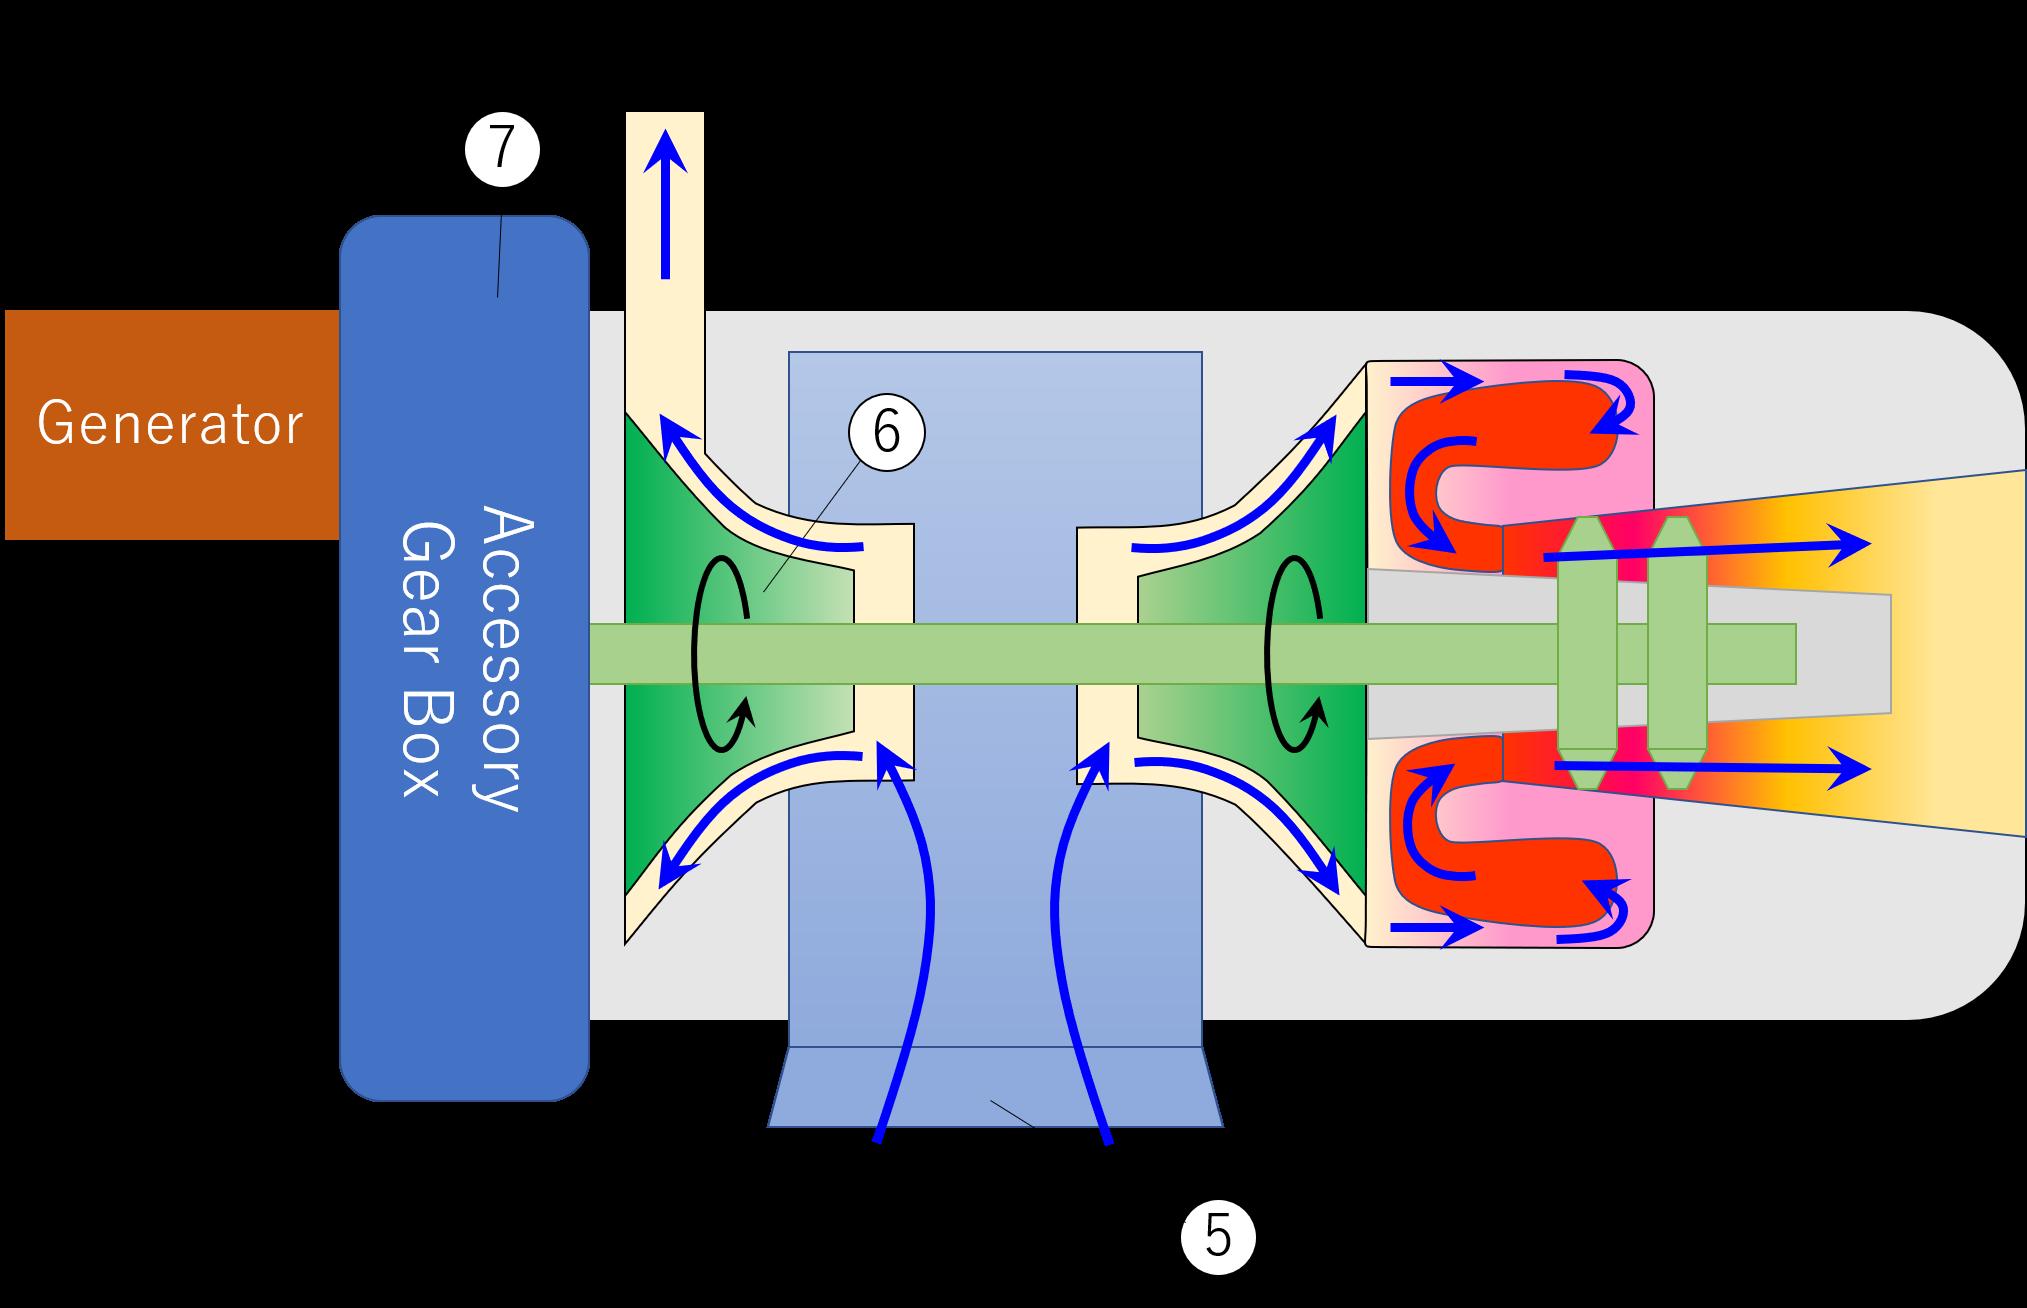 APUが圧縮空気と交流電源を作り出す仕組みのイメージ